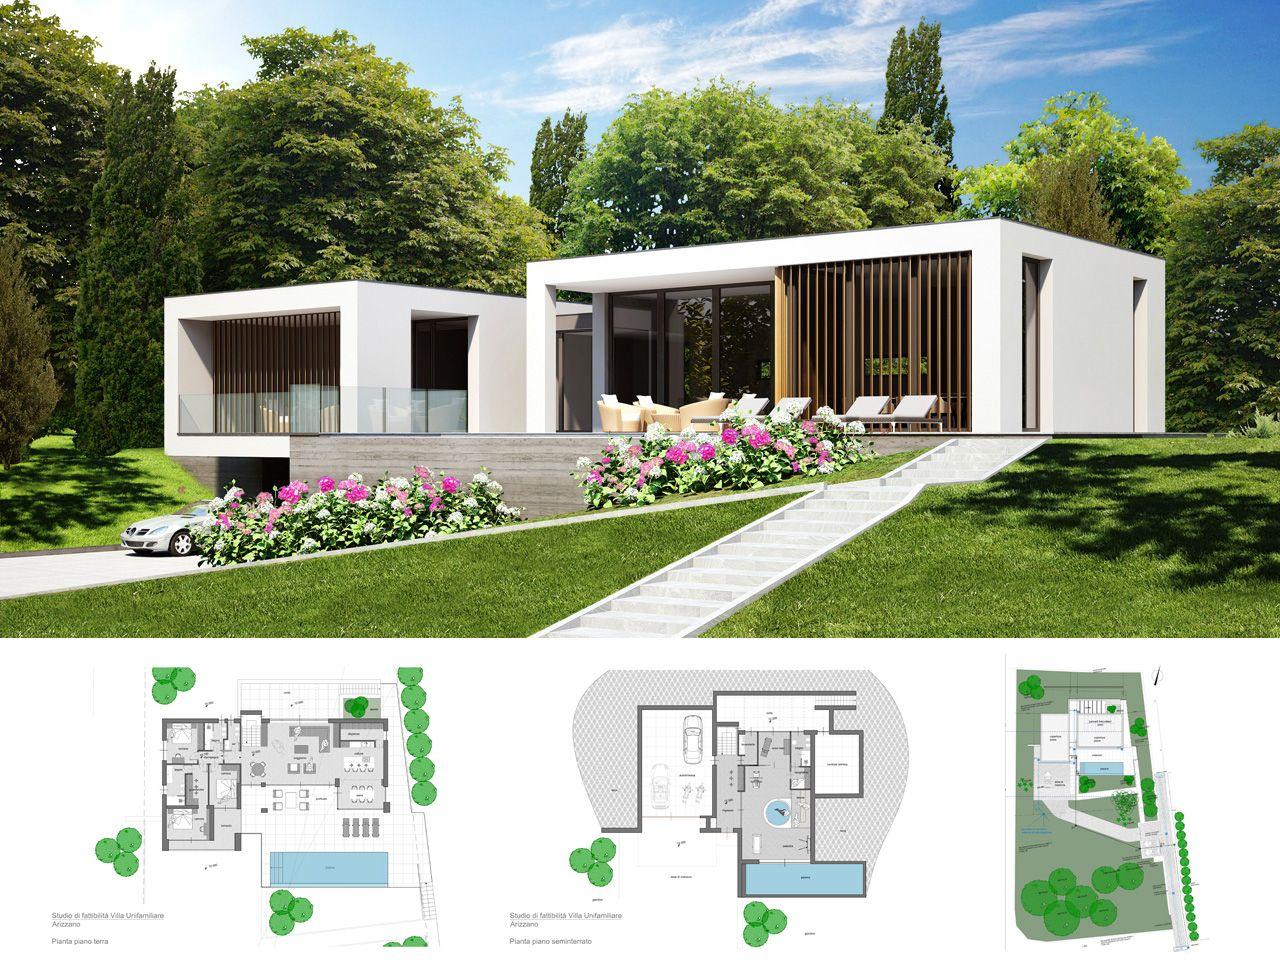 neubau villa kaufen in verbania mit pool und seeblick. Black Bedroom Furniture Sets. Home Design Ideas